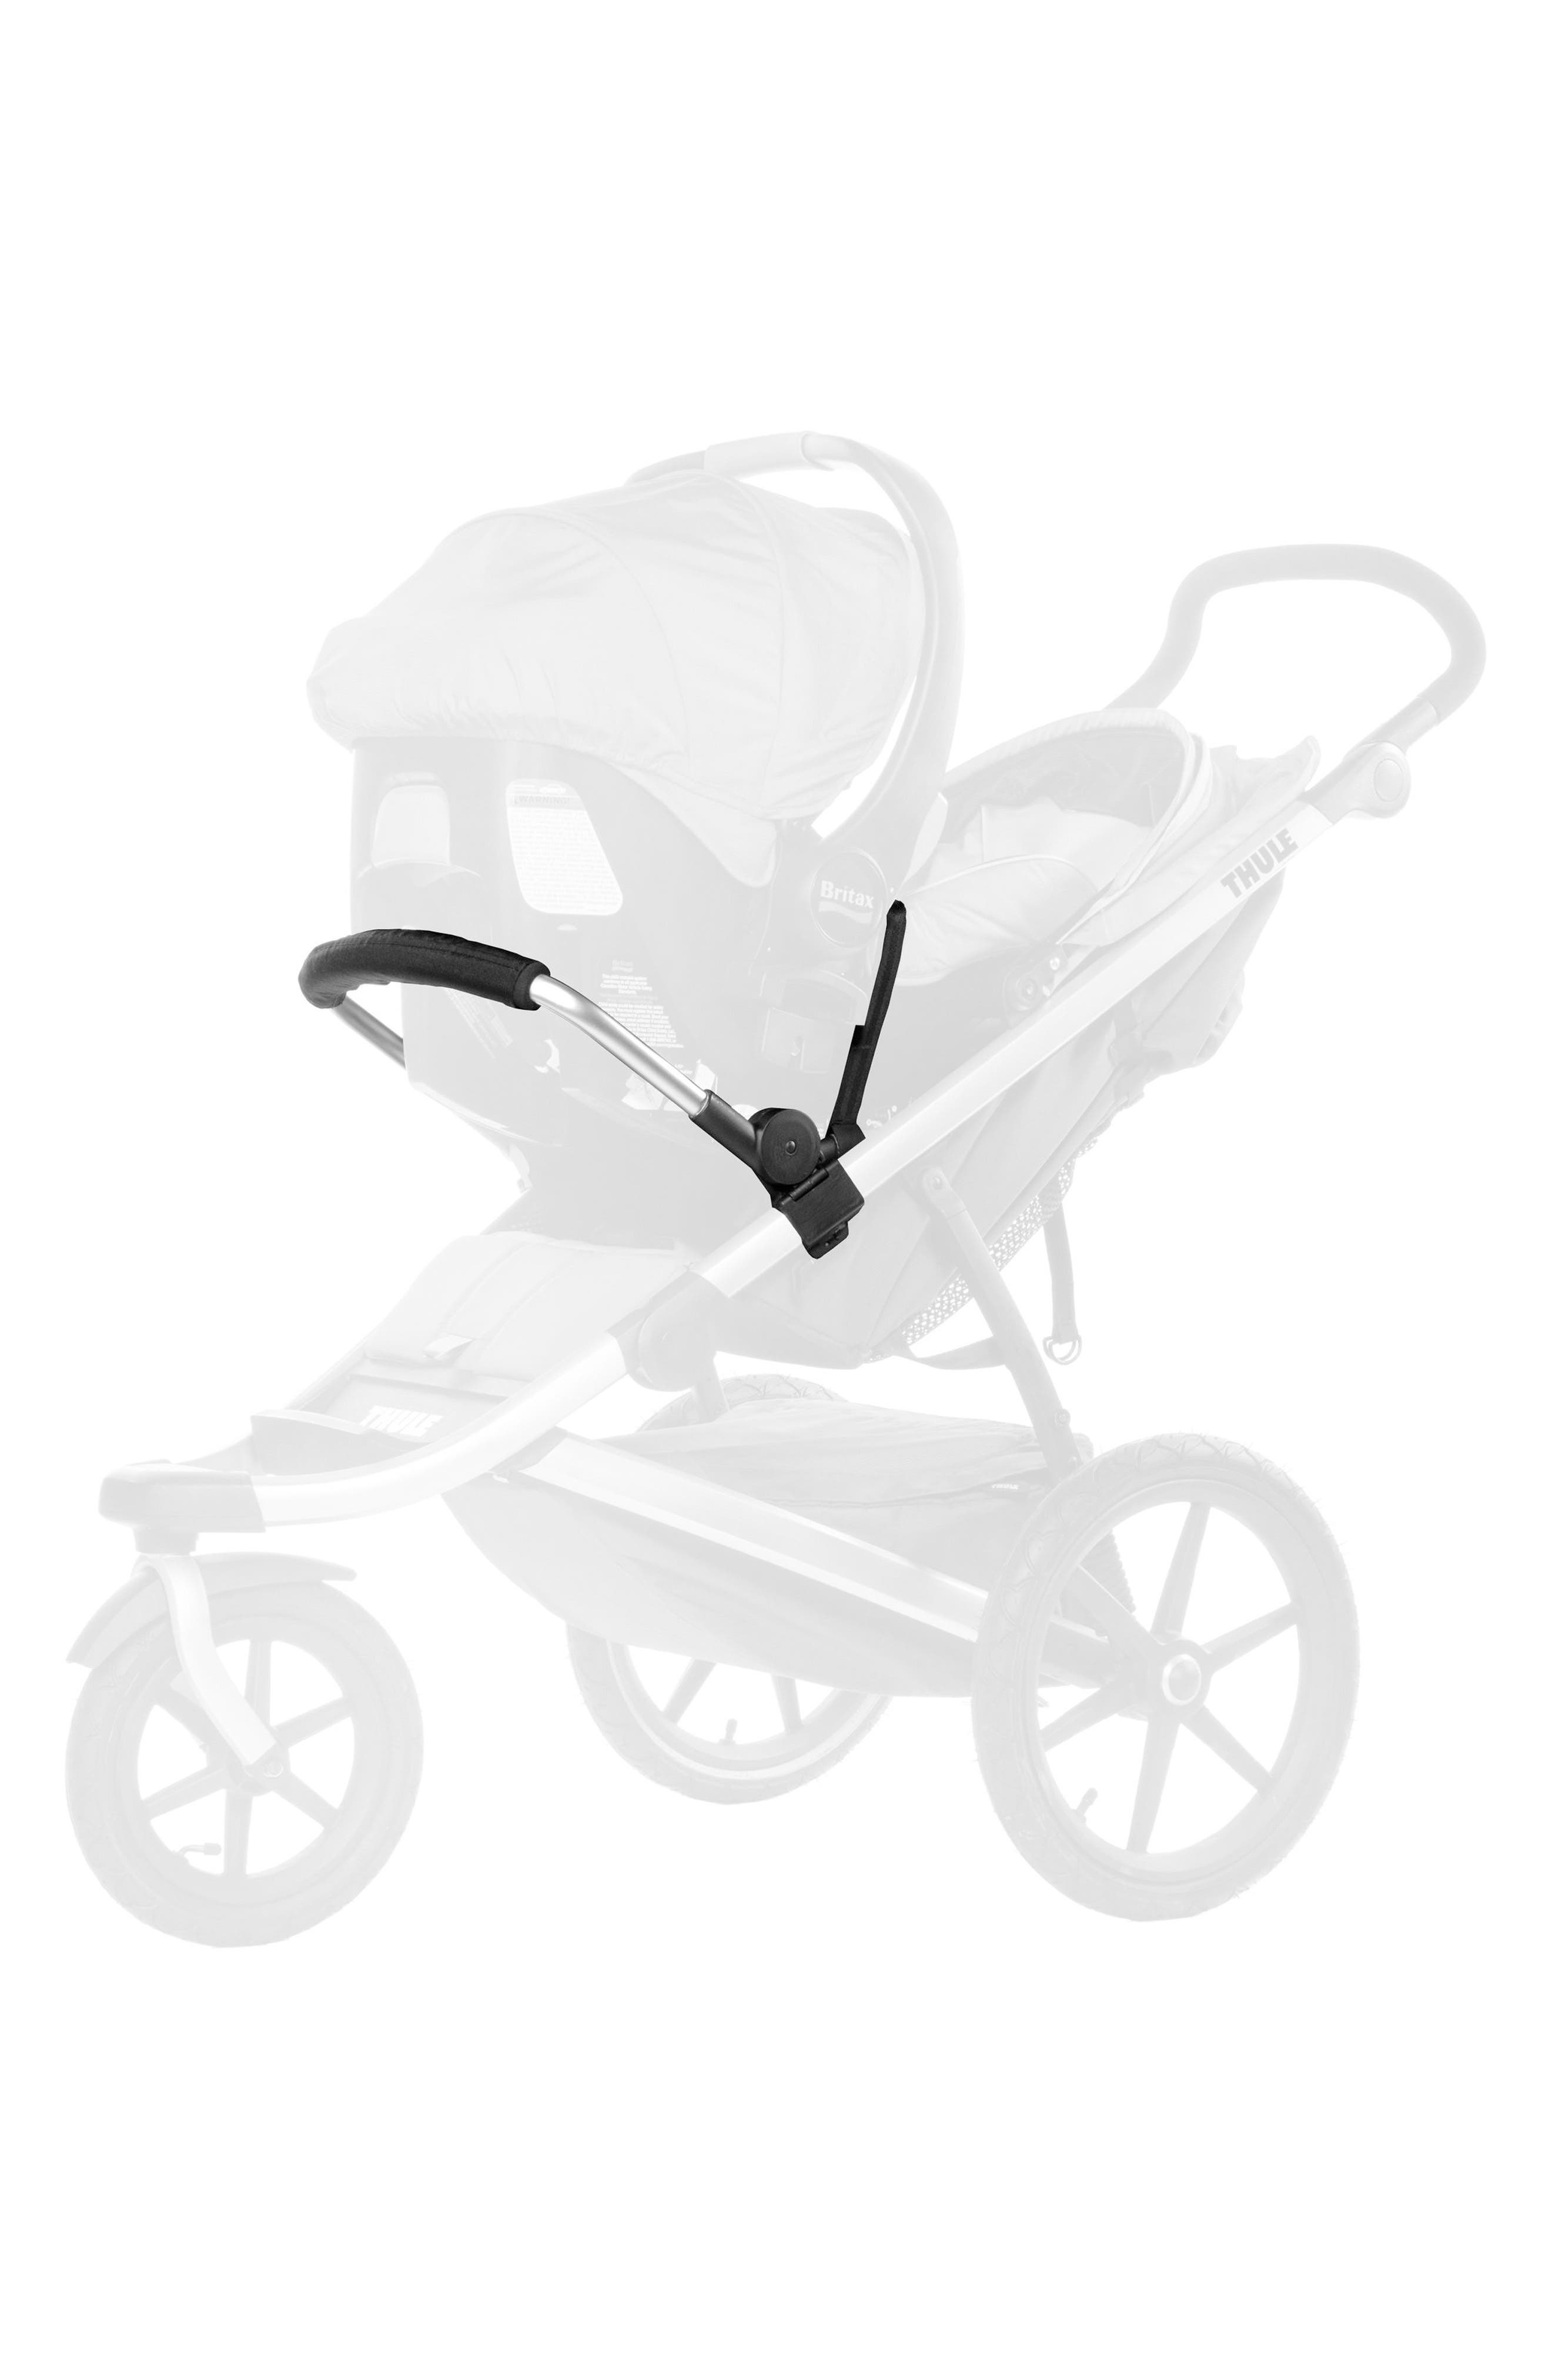 THULE,                             Glide & Urban Glide Infant Car Seat Adapter,                             Alternate thumbnail 2, color,                             BLACK